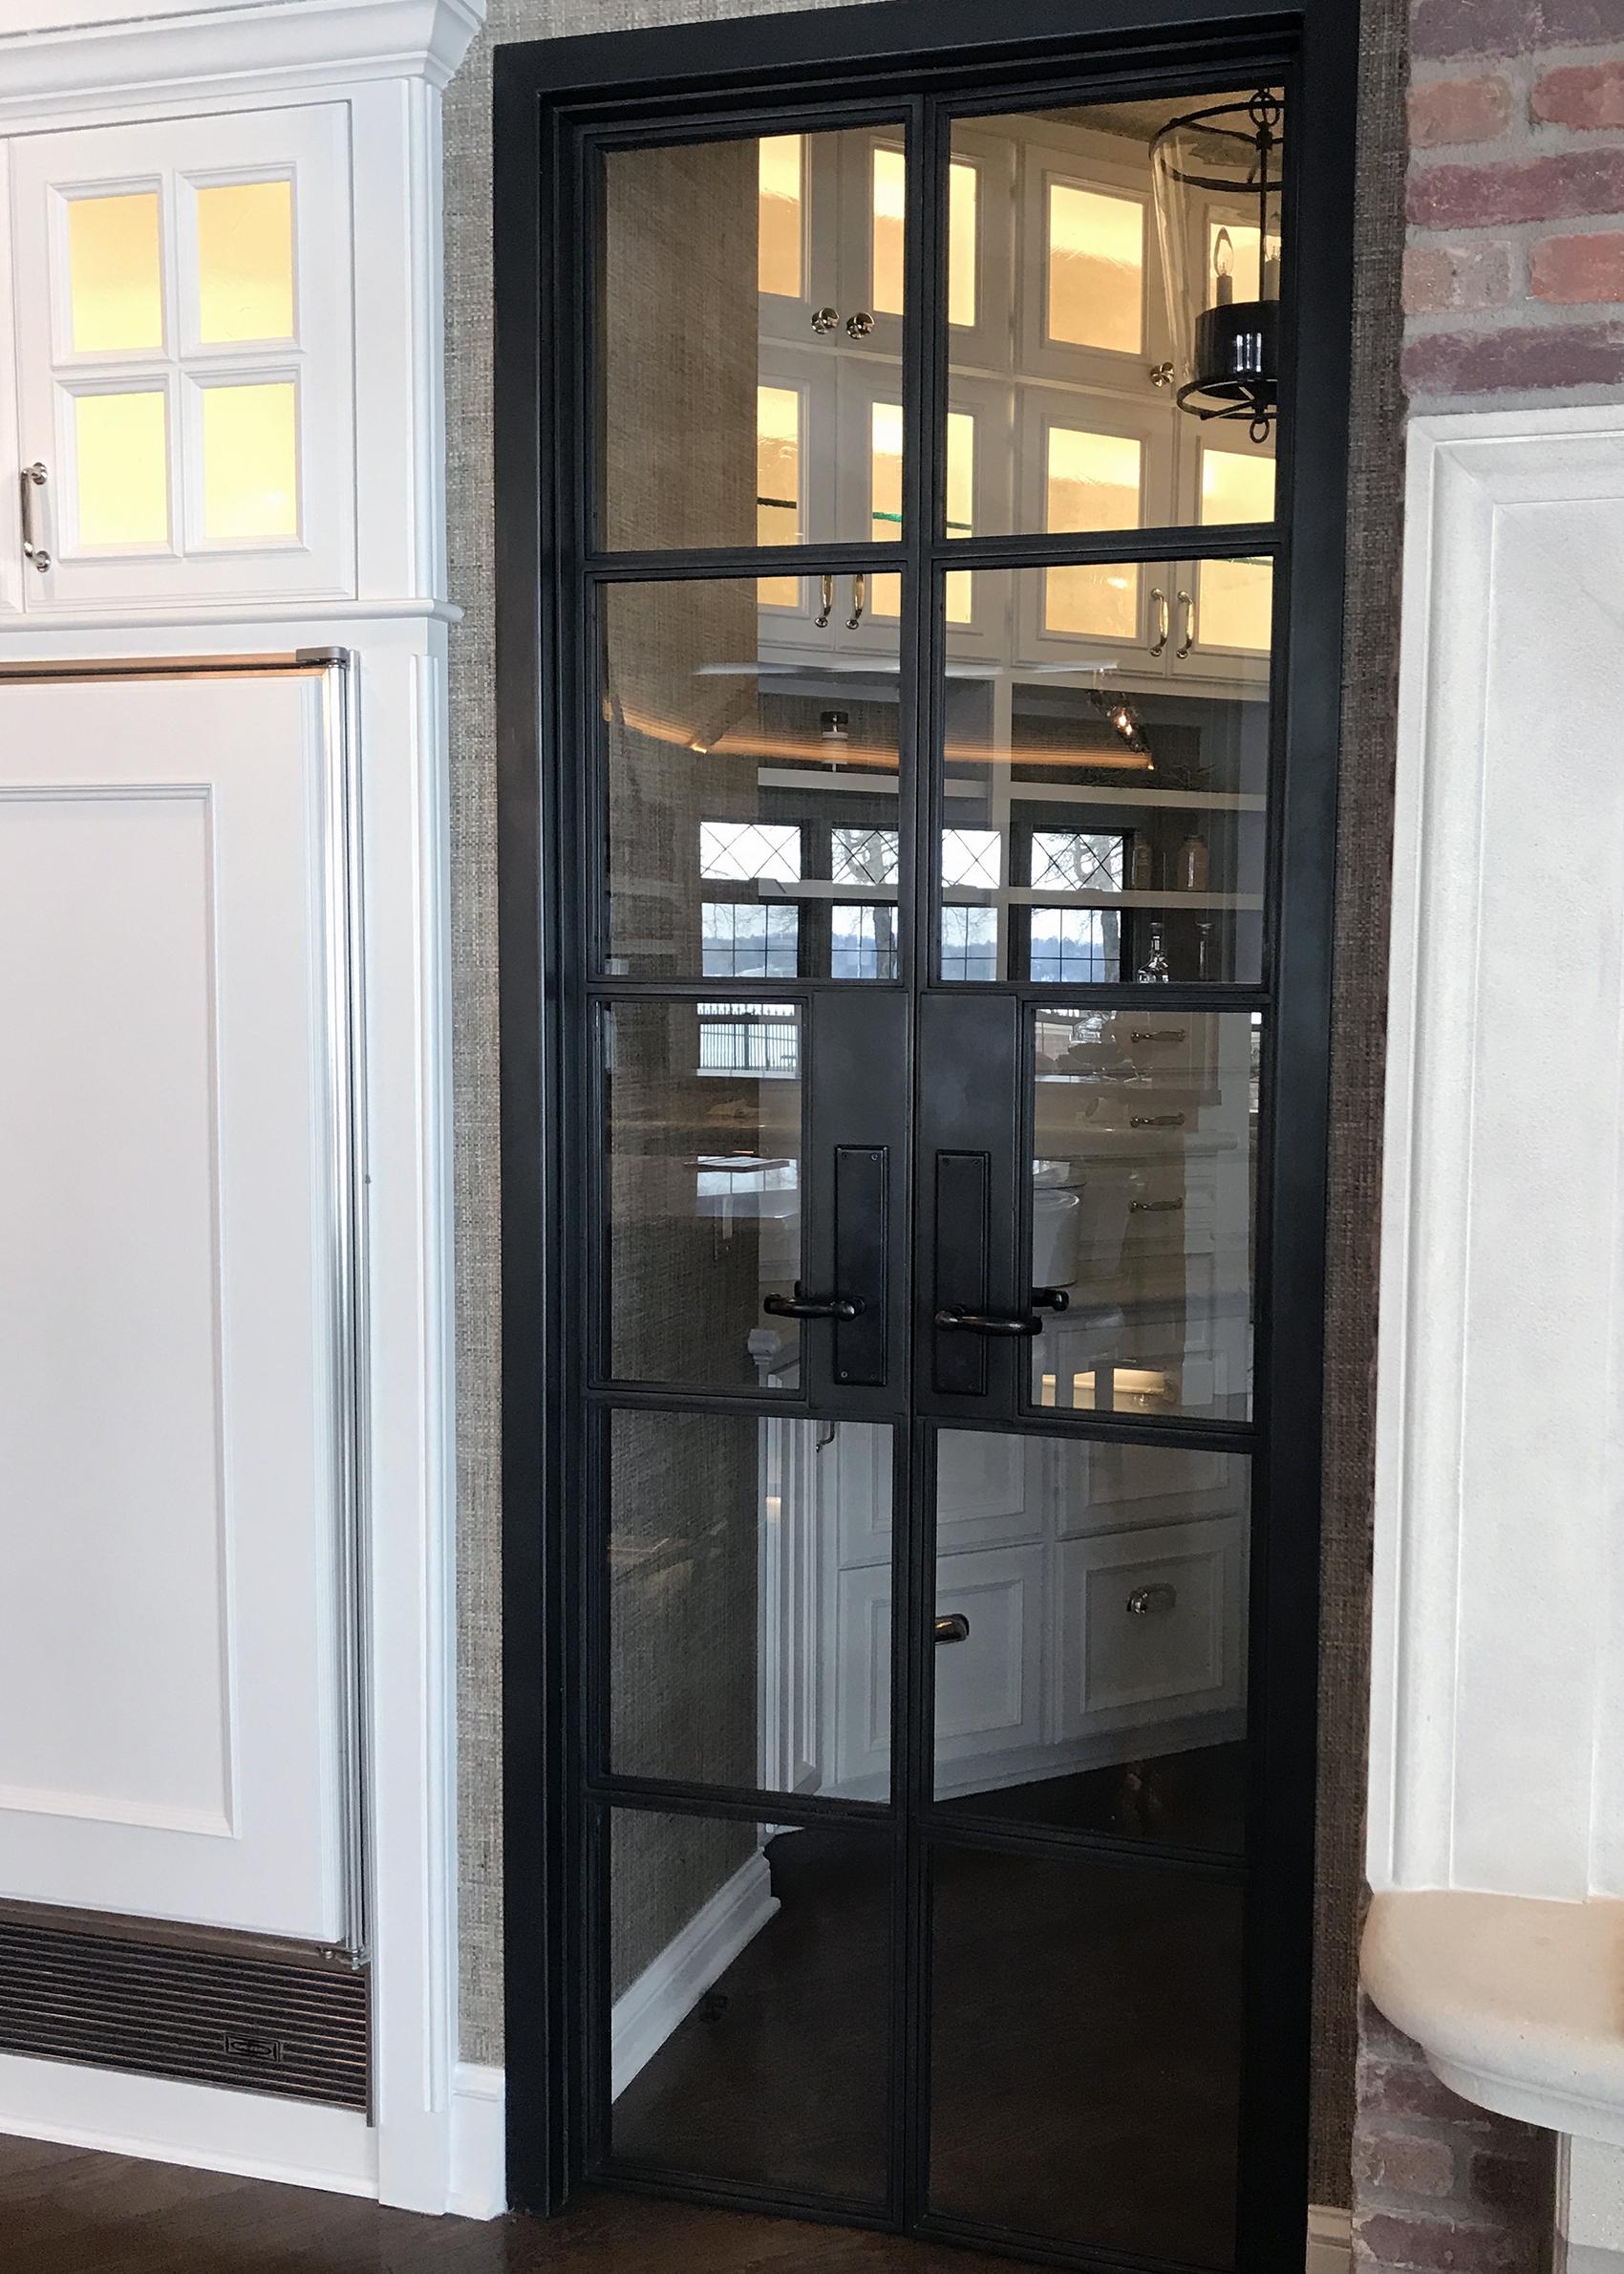 wine doors bauer metal fabrication fabricator custom blackened steel architectural metal interior design minnesota mn 7.jpg